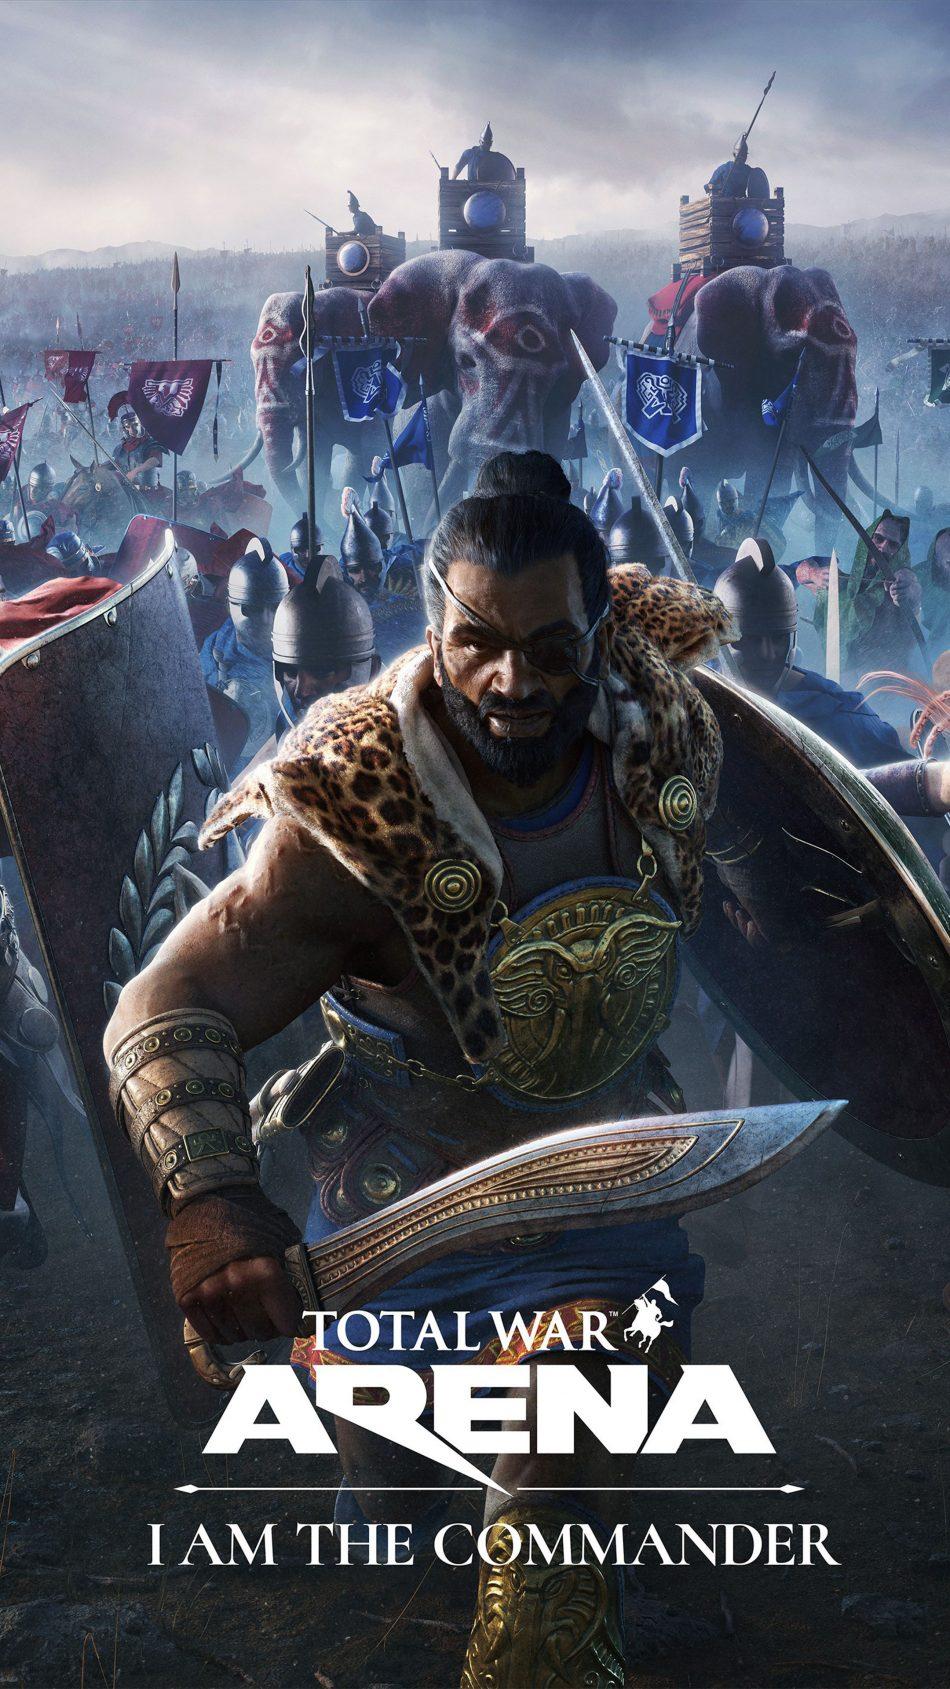 Total War Arena - I Am The Commander 4K Ultra HD Mobile Wallpaper